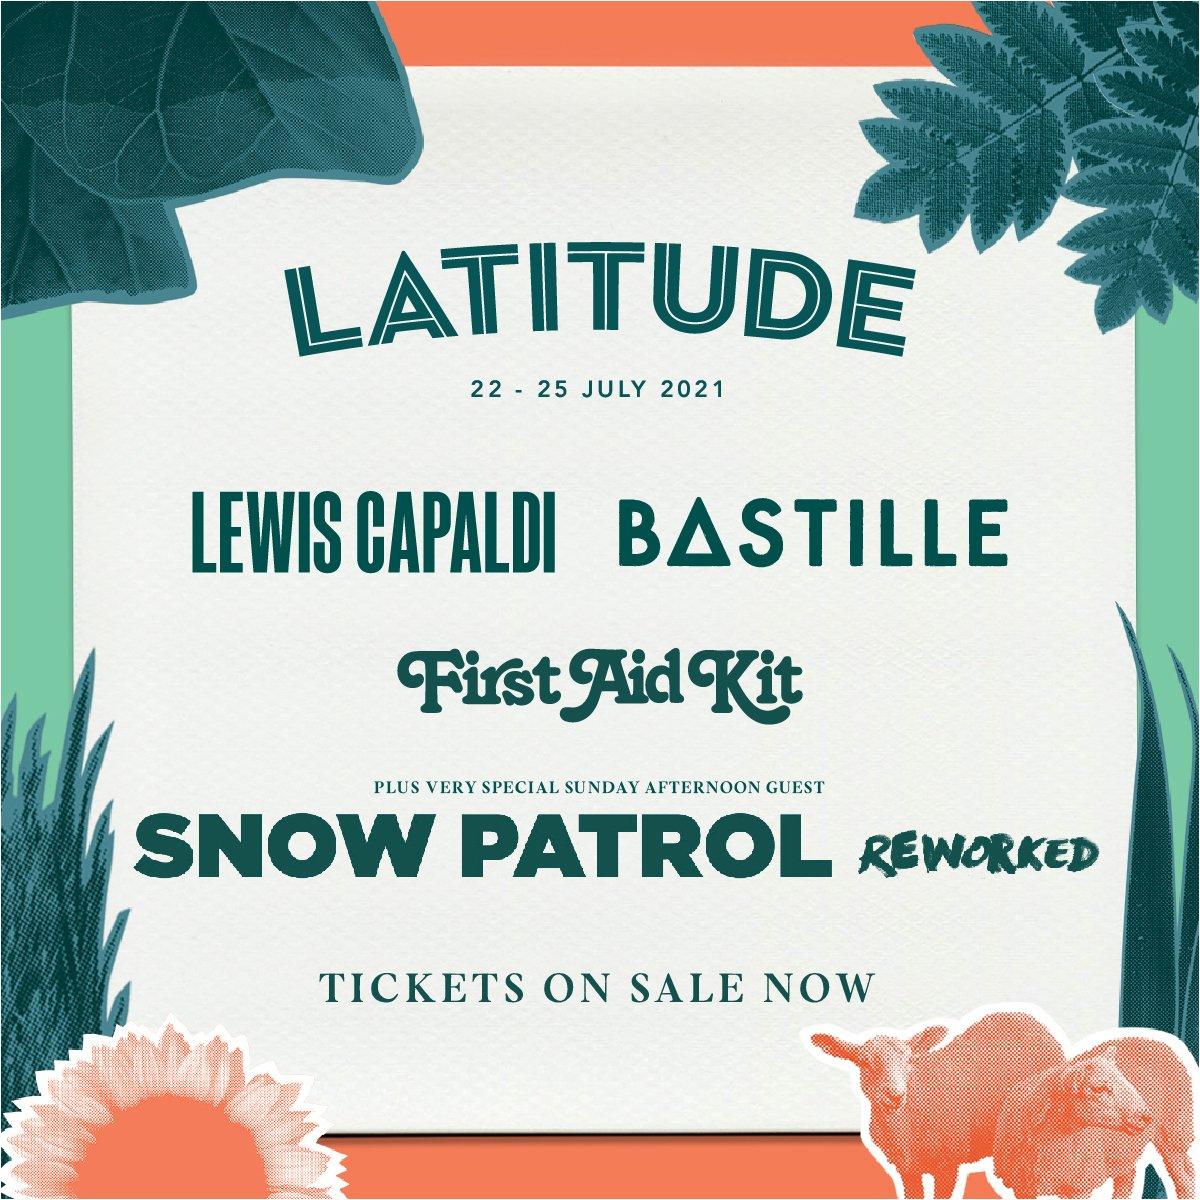 Latitude 2020 Line Up Poster